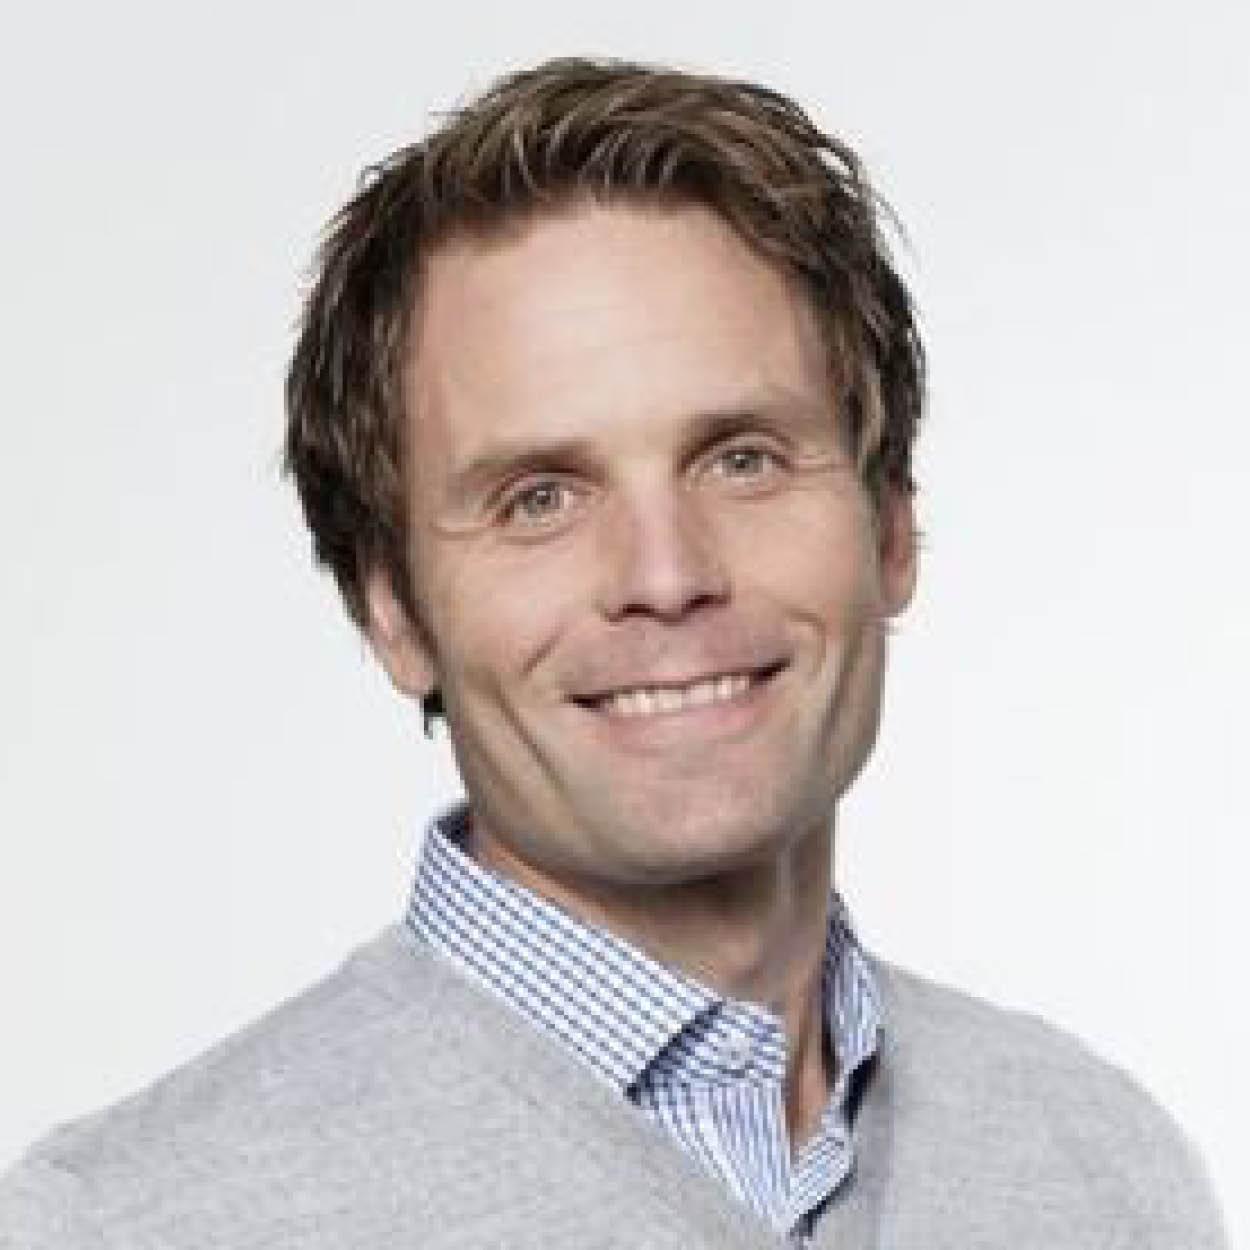 Nils Christian Kaaresen i Brages Bilforretning